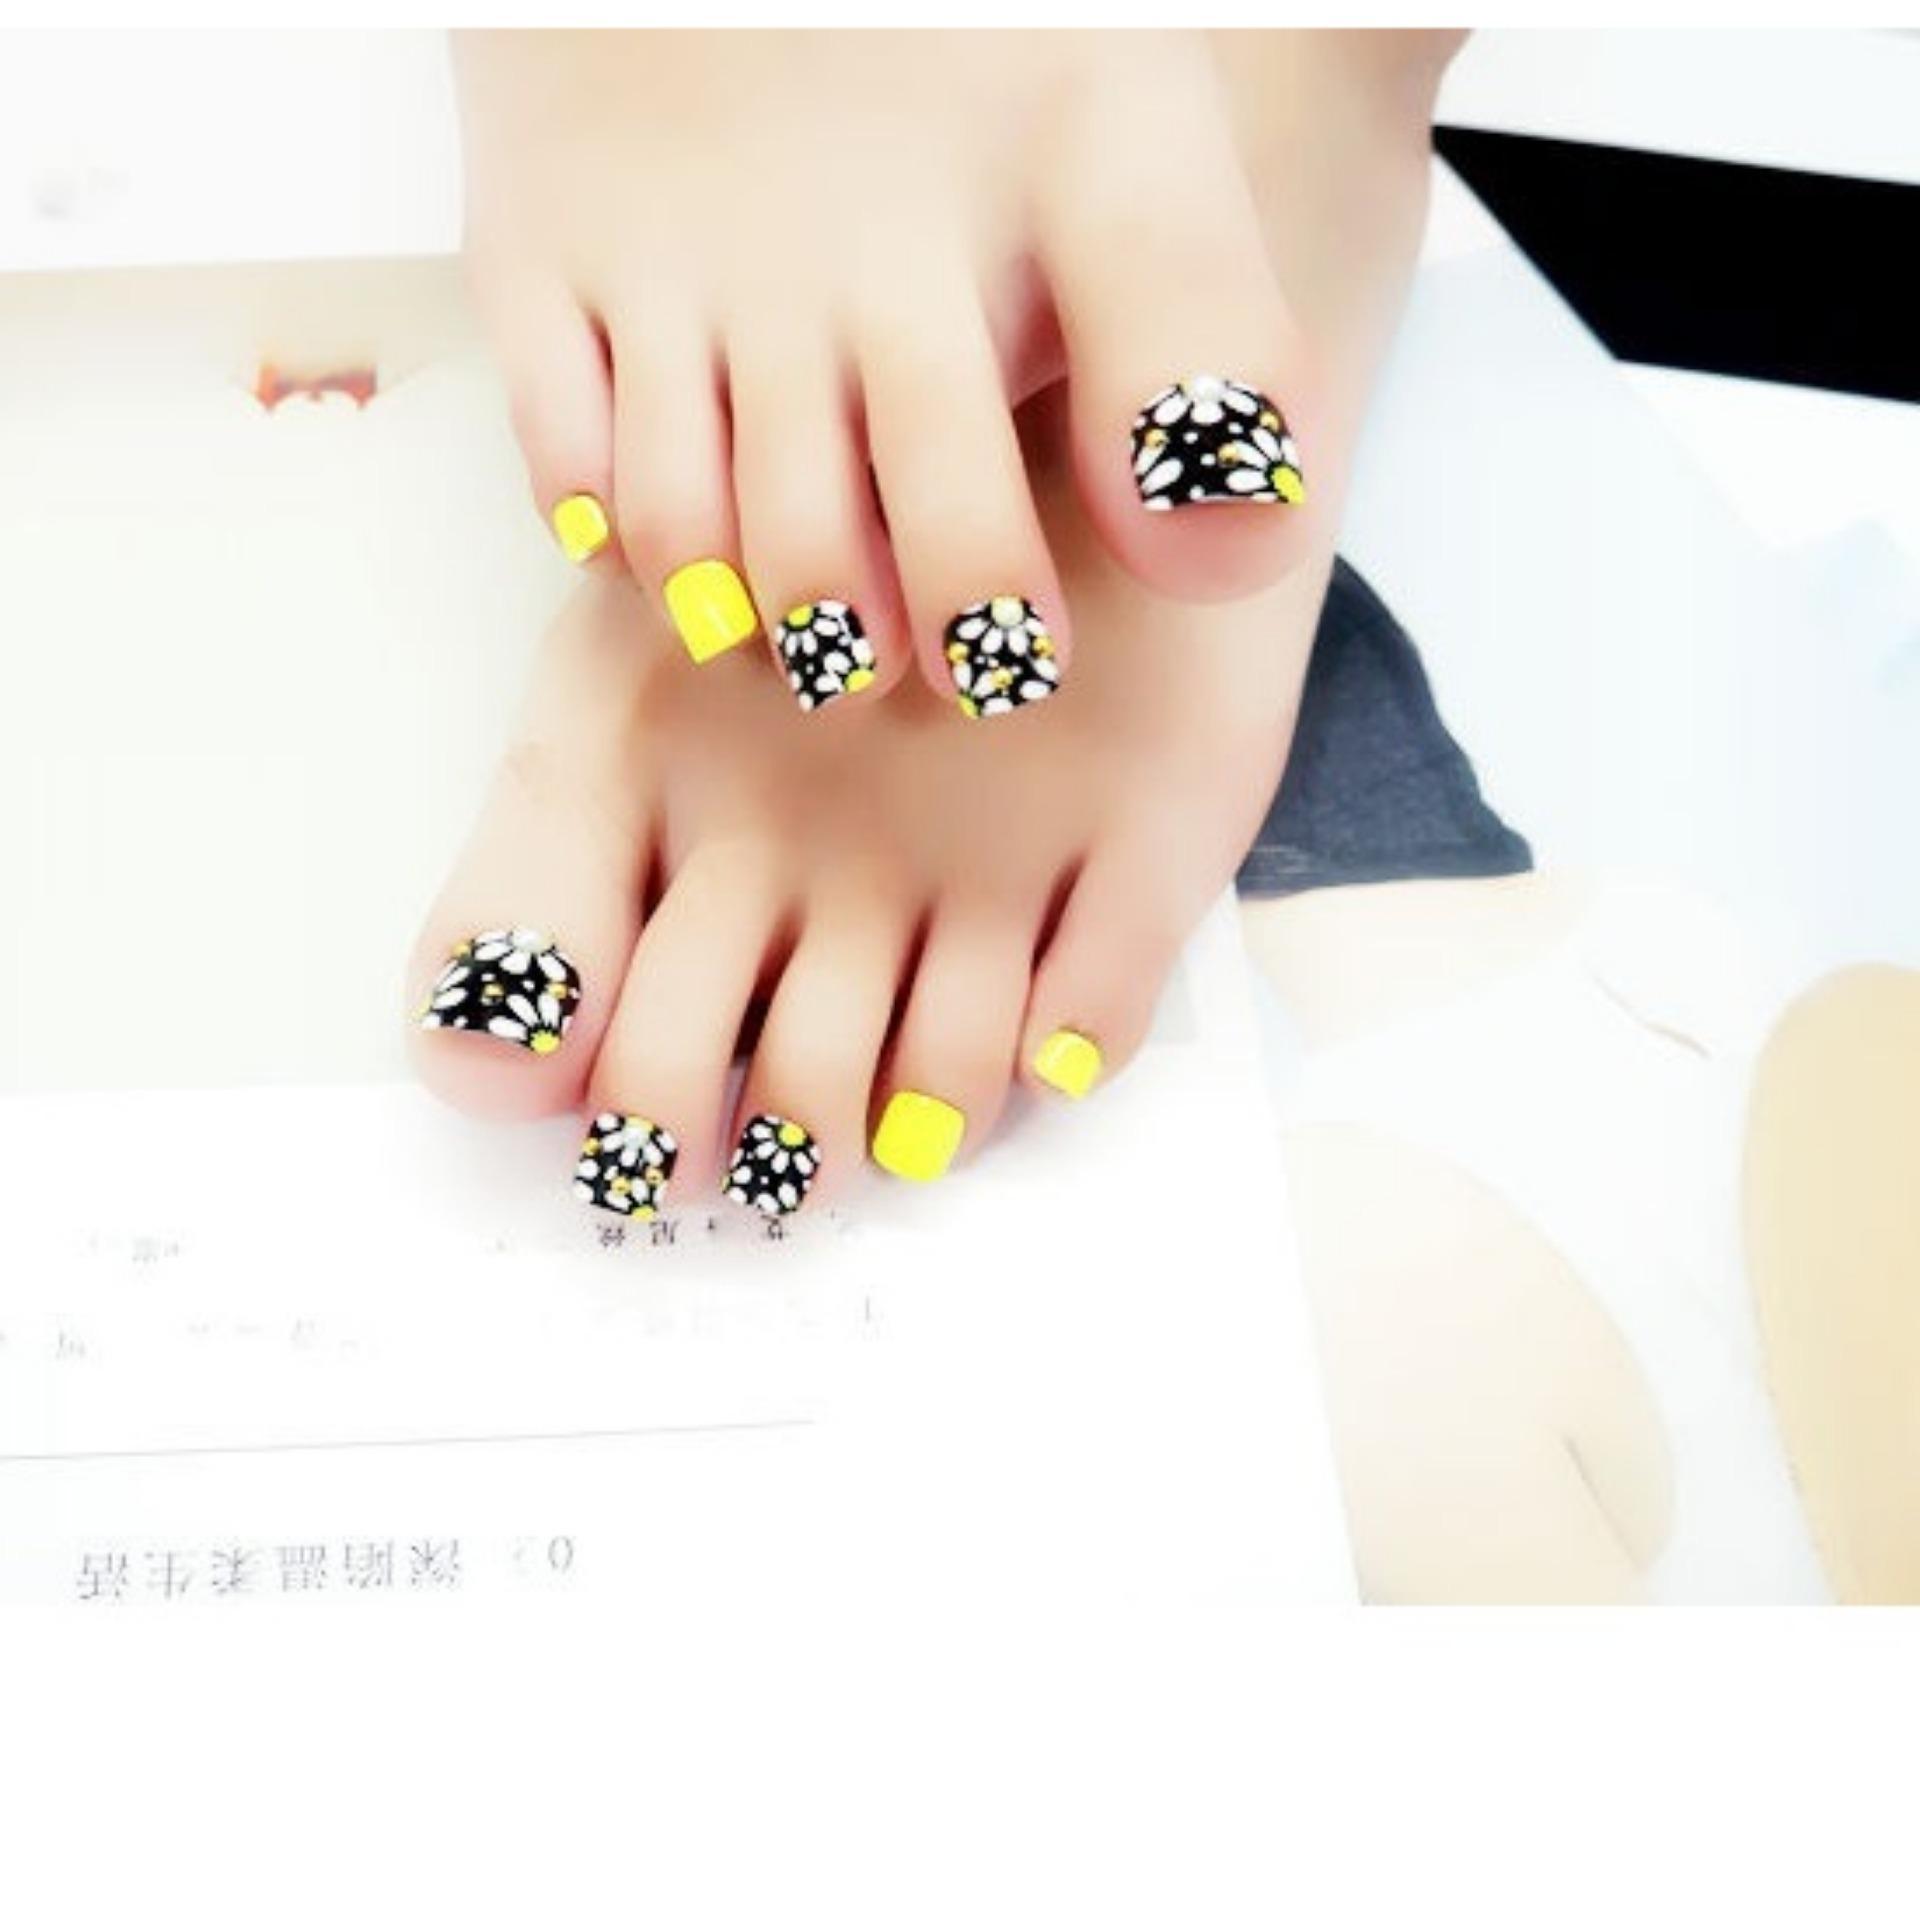 Fitur Kuku Palsu Jbs Nails Pengantin Warna 3d A26 Dan Harga Terbaru Wedding Fake Nail Art Simple A13 Kaki Blink Black Flower A8